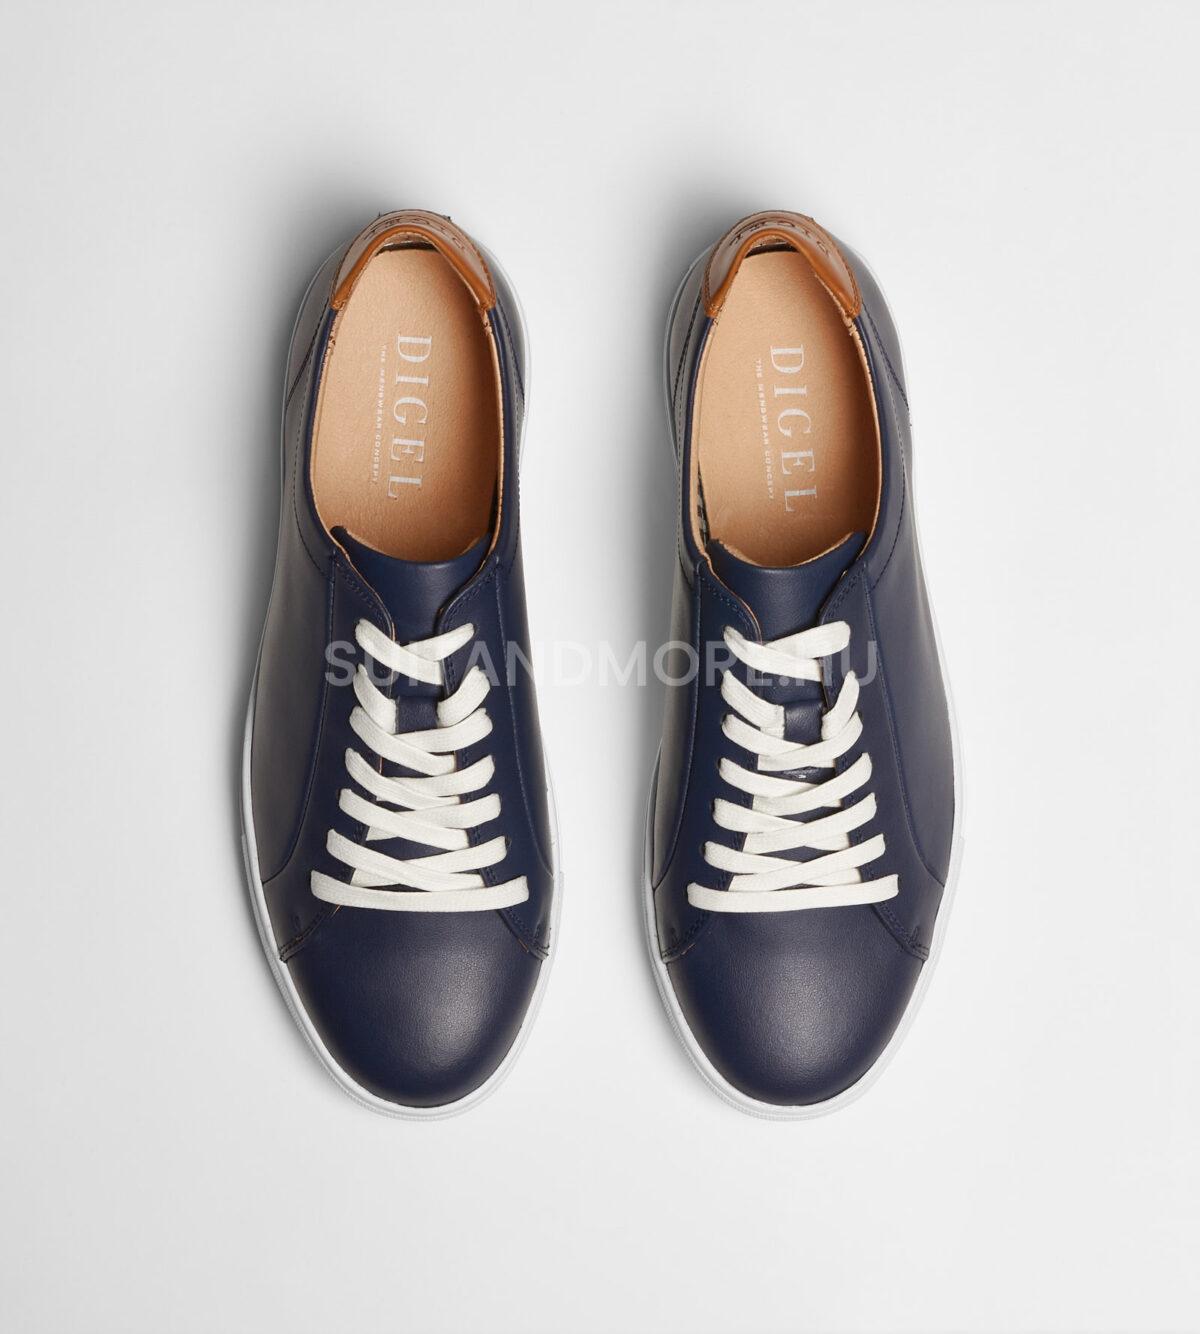 digel-kek-sneaker-cipo-seth-1189704-20-04